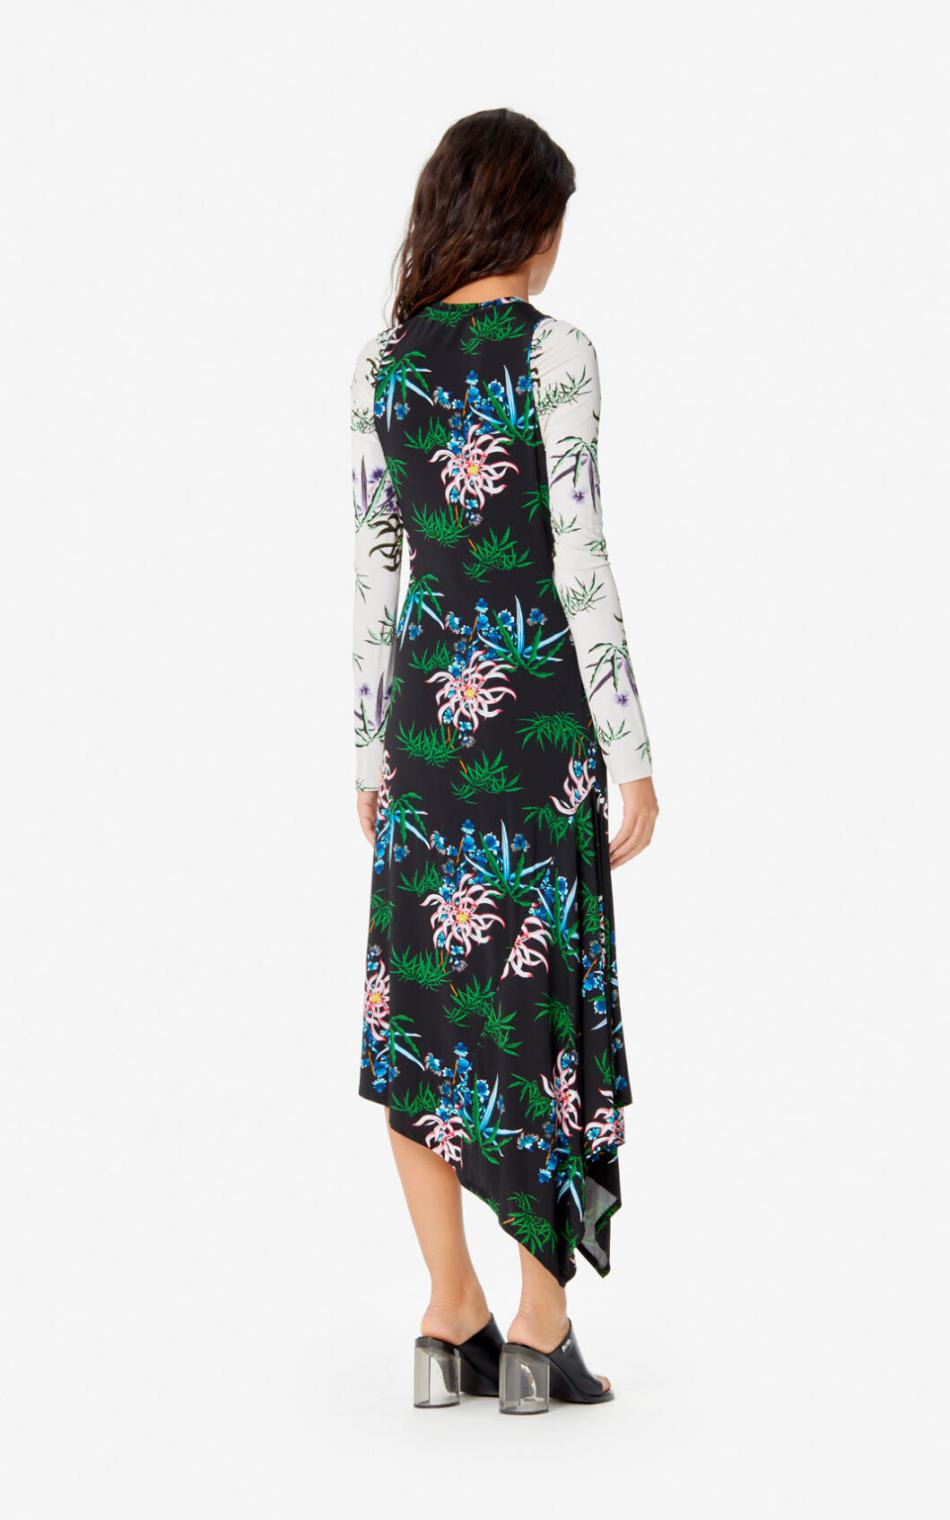 Damen Kenzo Kleider  Langes Kleid 'Sea Lily' Black — Nuerahha